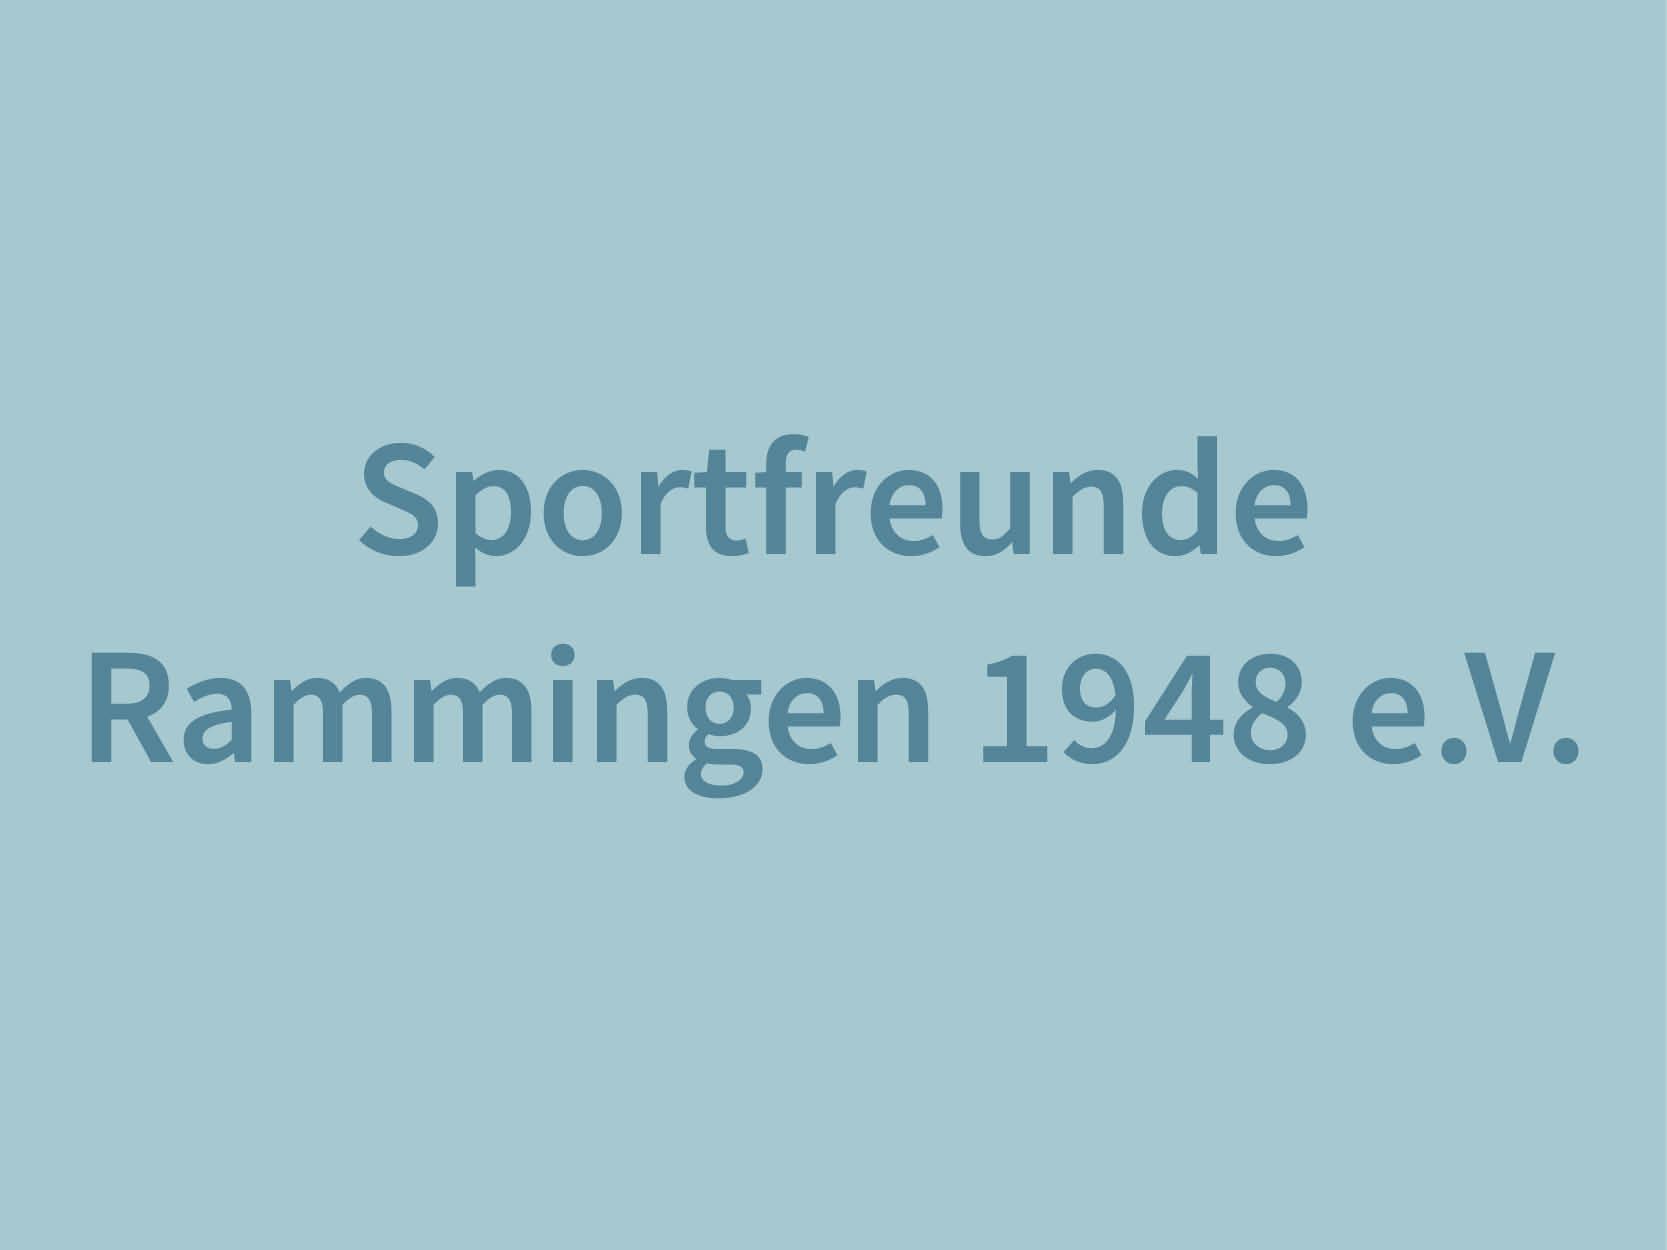 Sportfreunde Rammingen 1948 e.V.